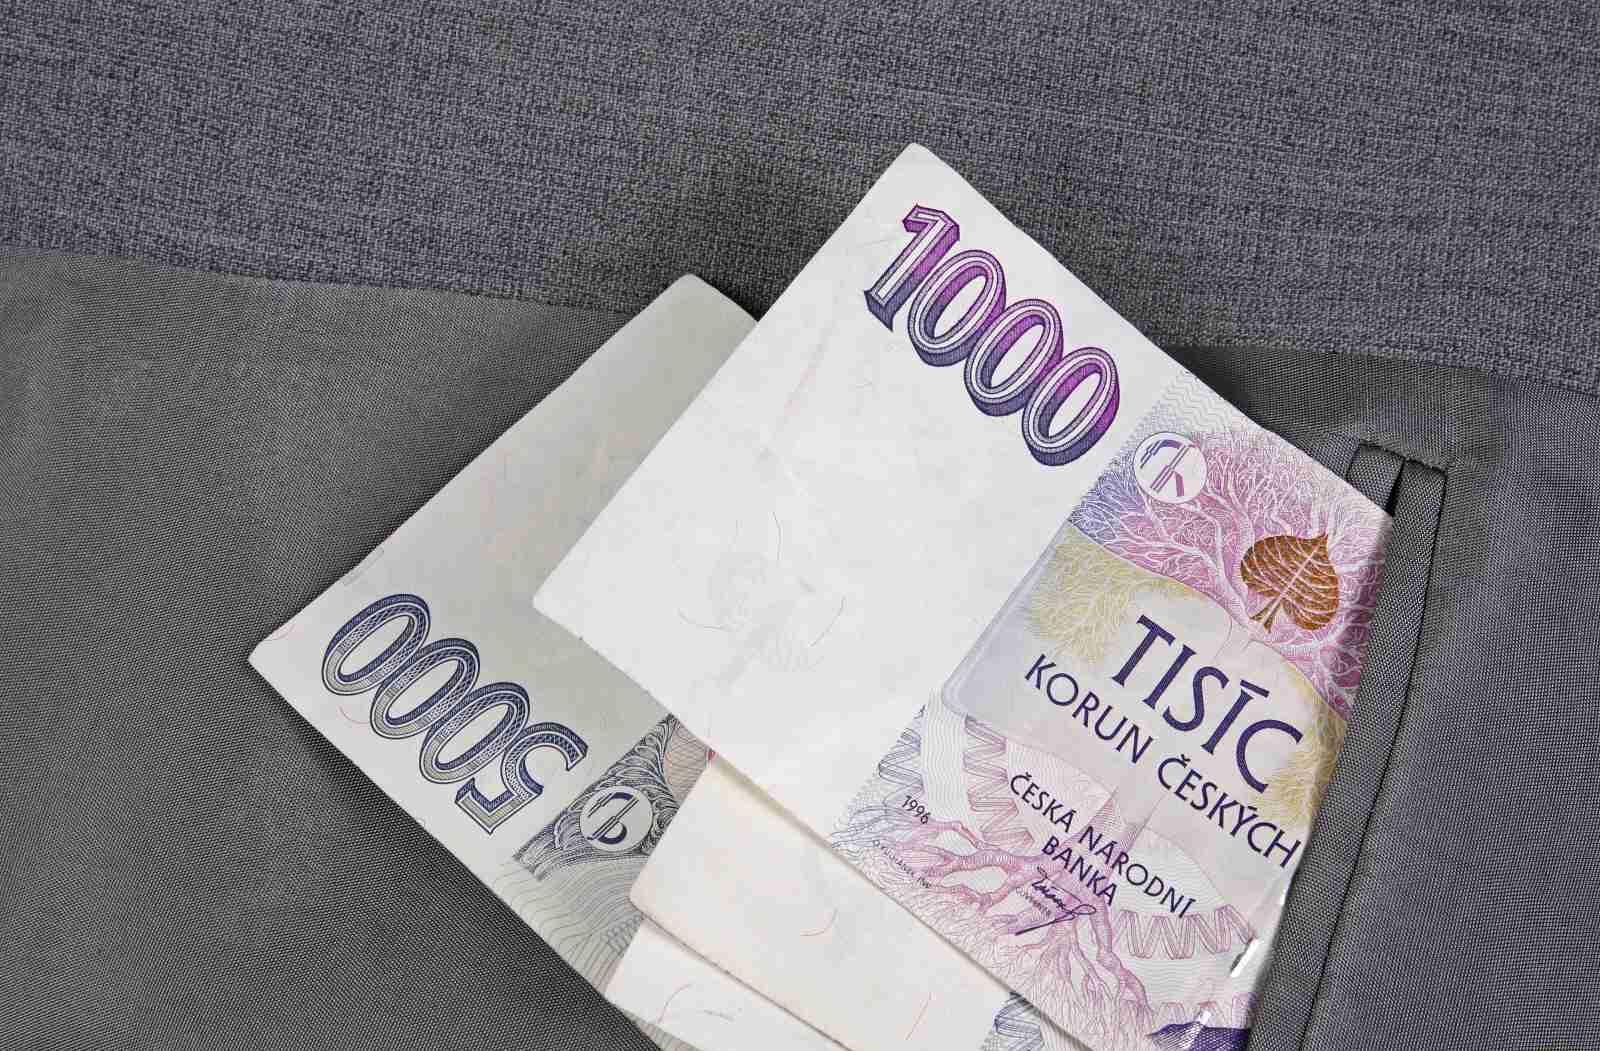 Půjčka do 10 000 Kč bez registru